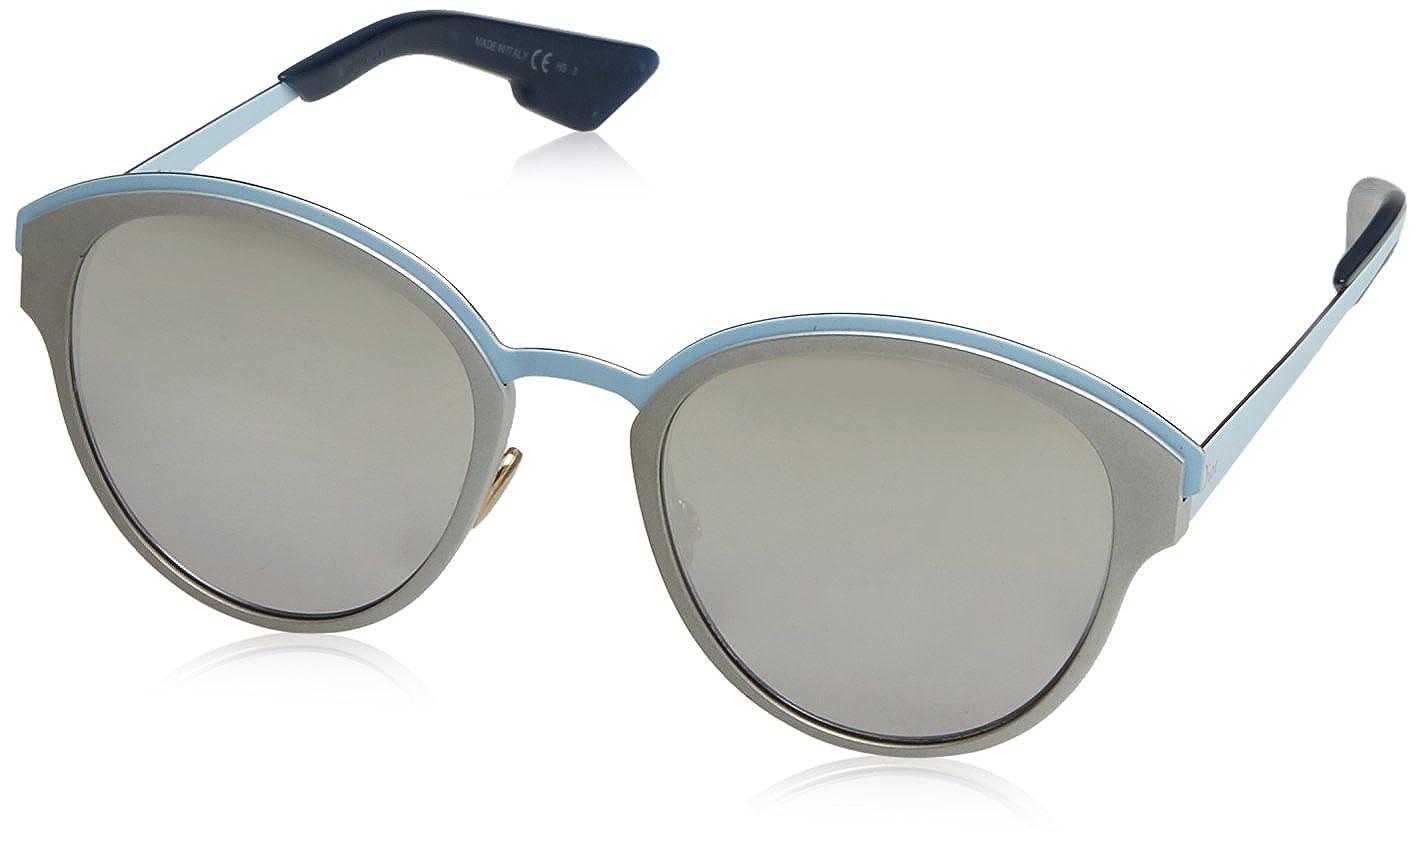 Christian Dior Mujer DIORSUN 96 RCV Gafas de sol, Azul ...